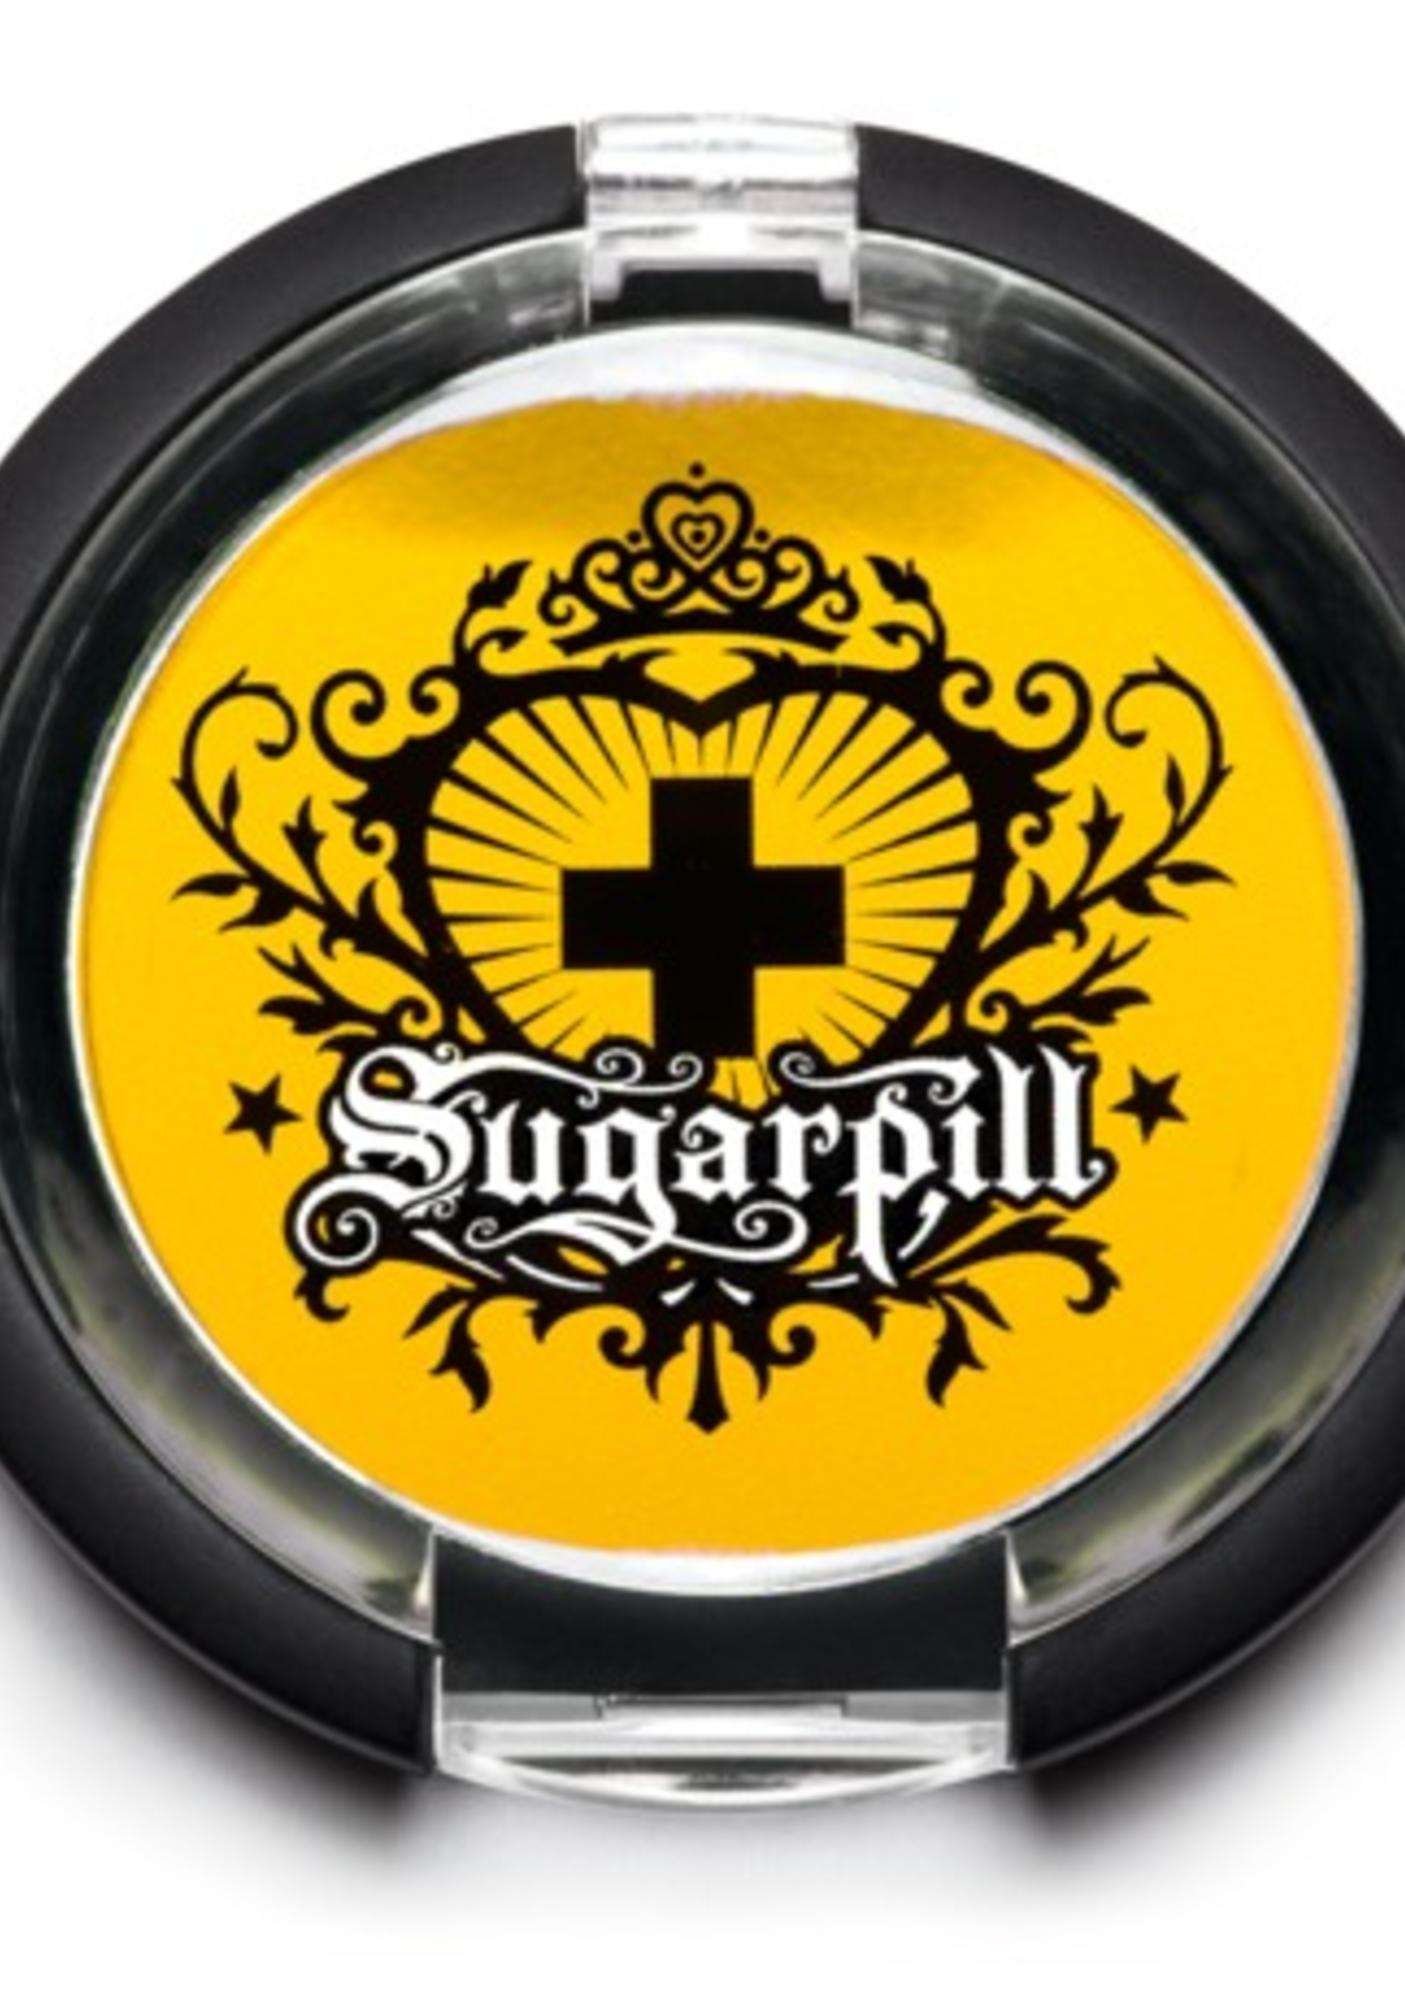 Sugarpill Buttercupcake Pressed Eyeshadow